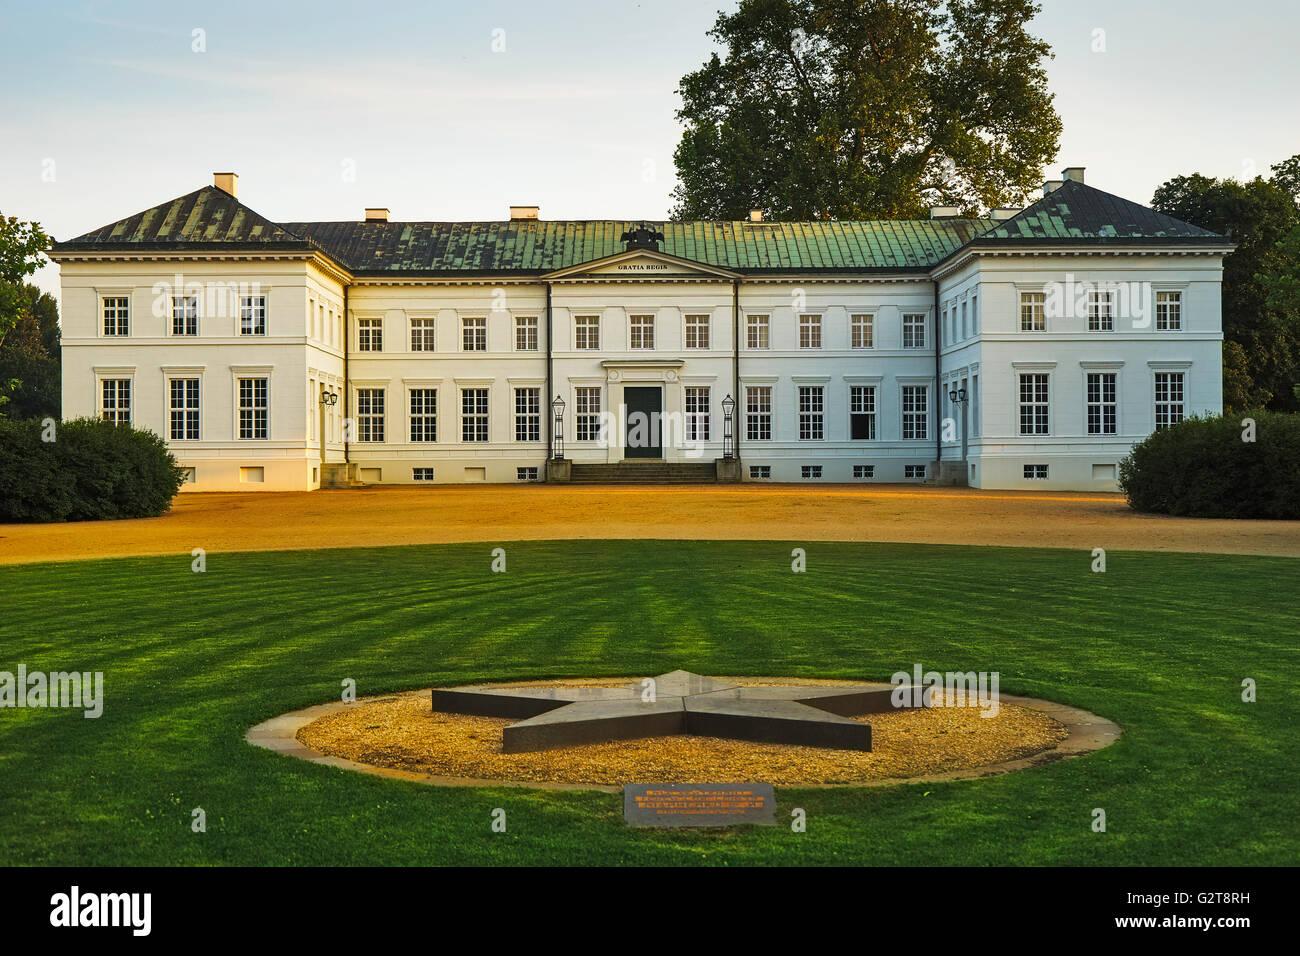 Castle of Neuhardenberg Stock Photo